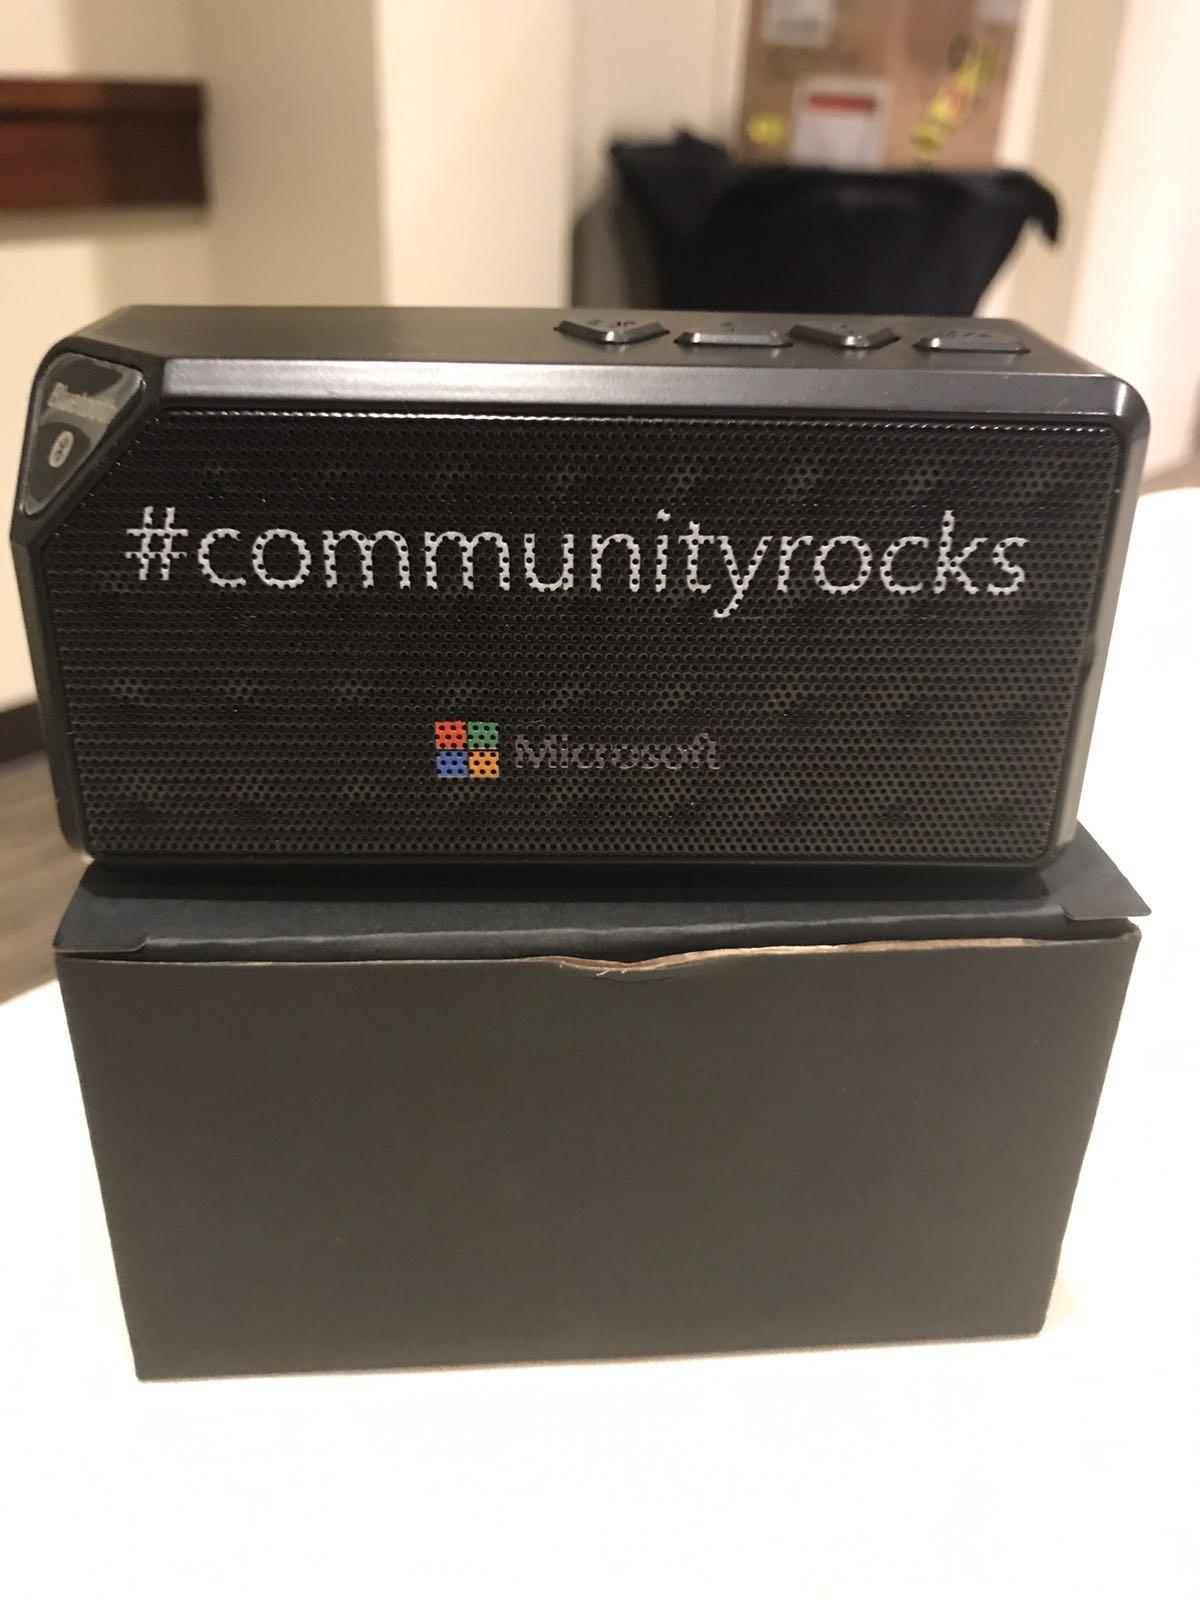 Community Speaker gadget